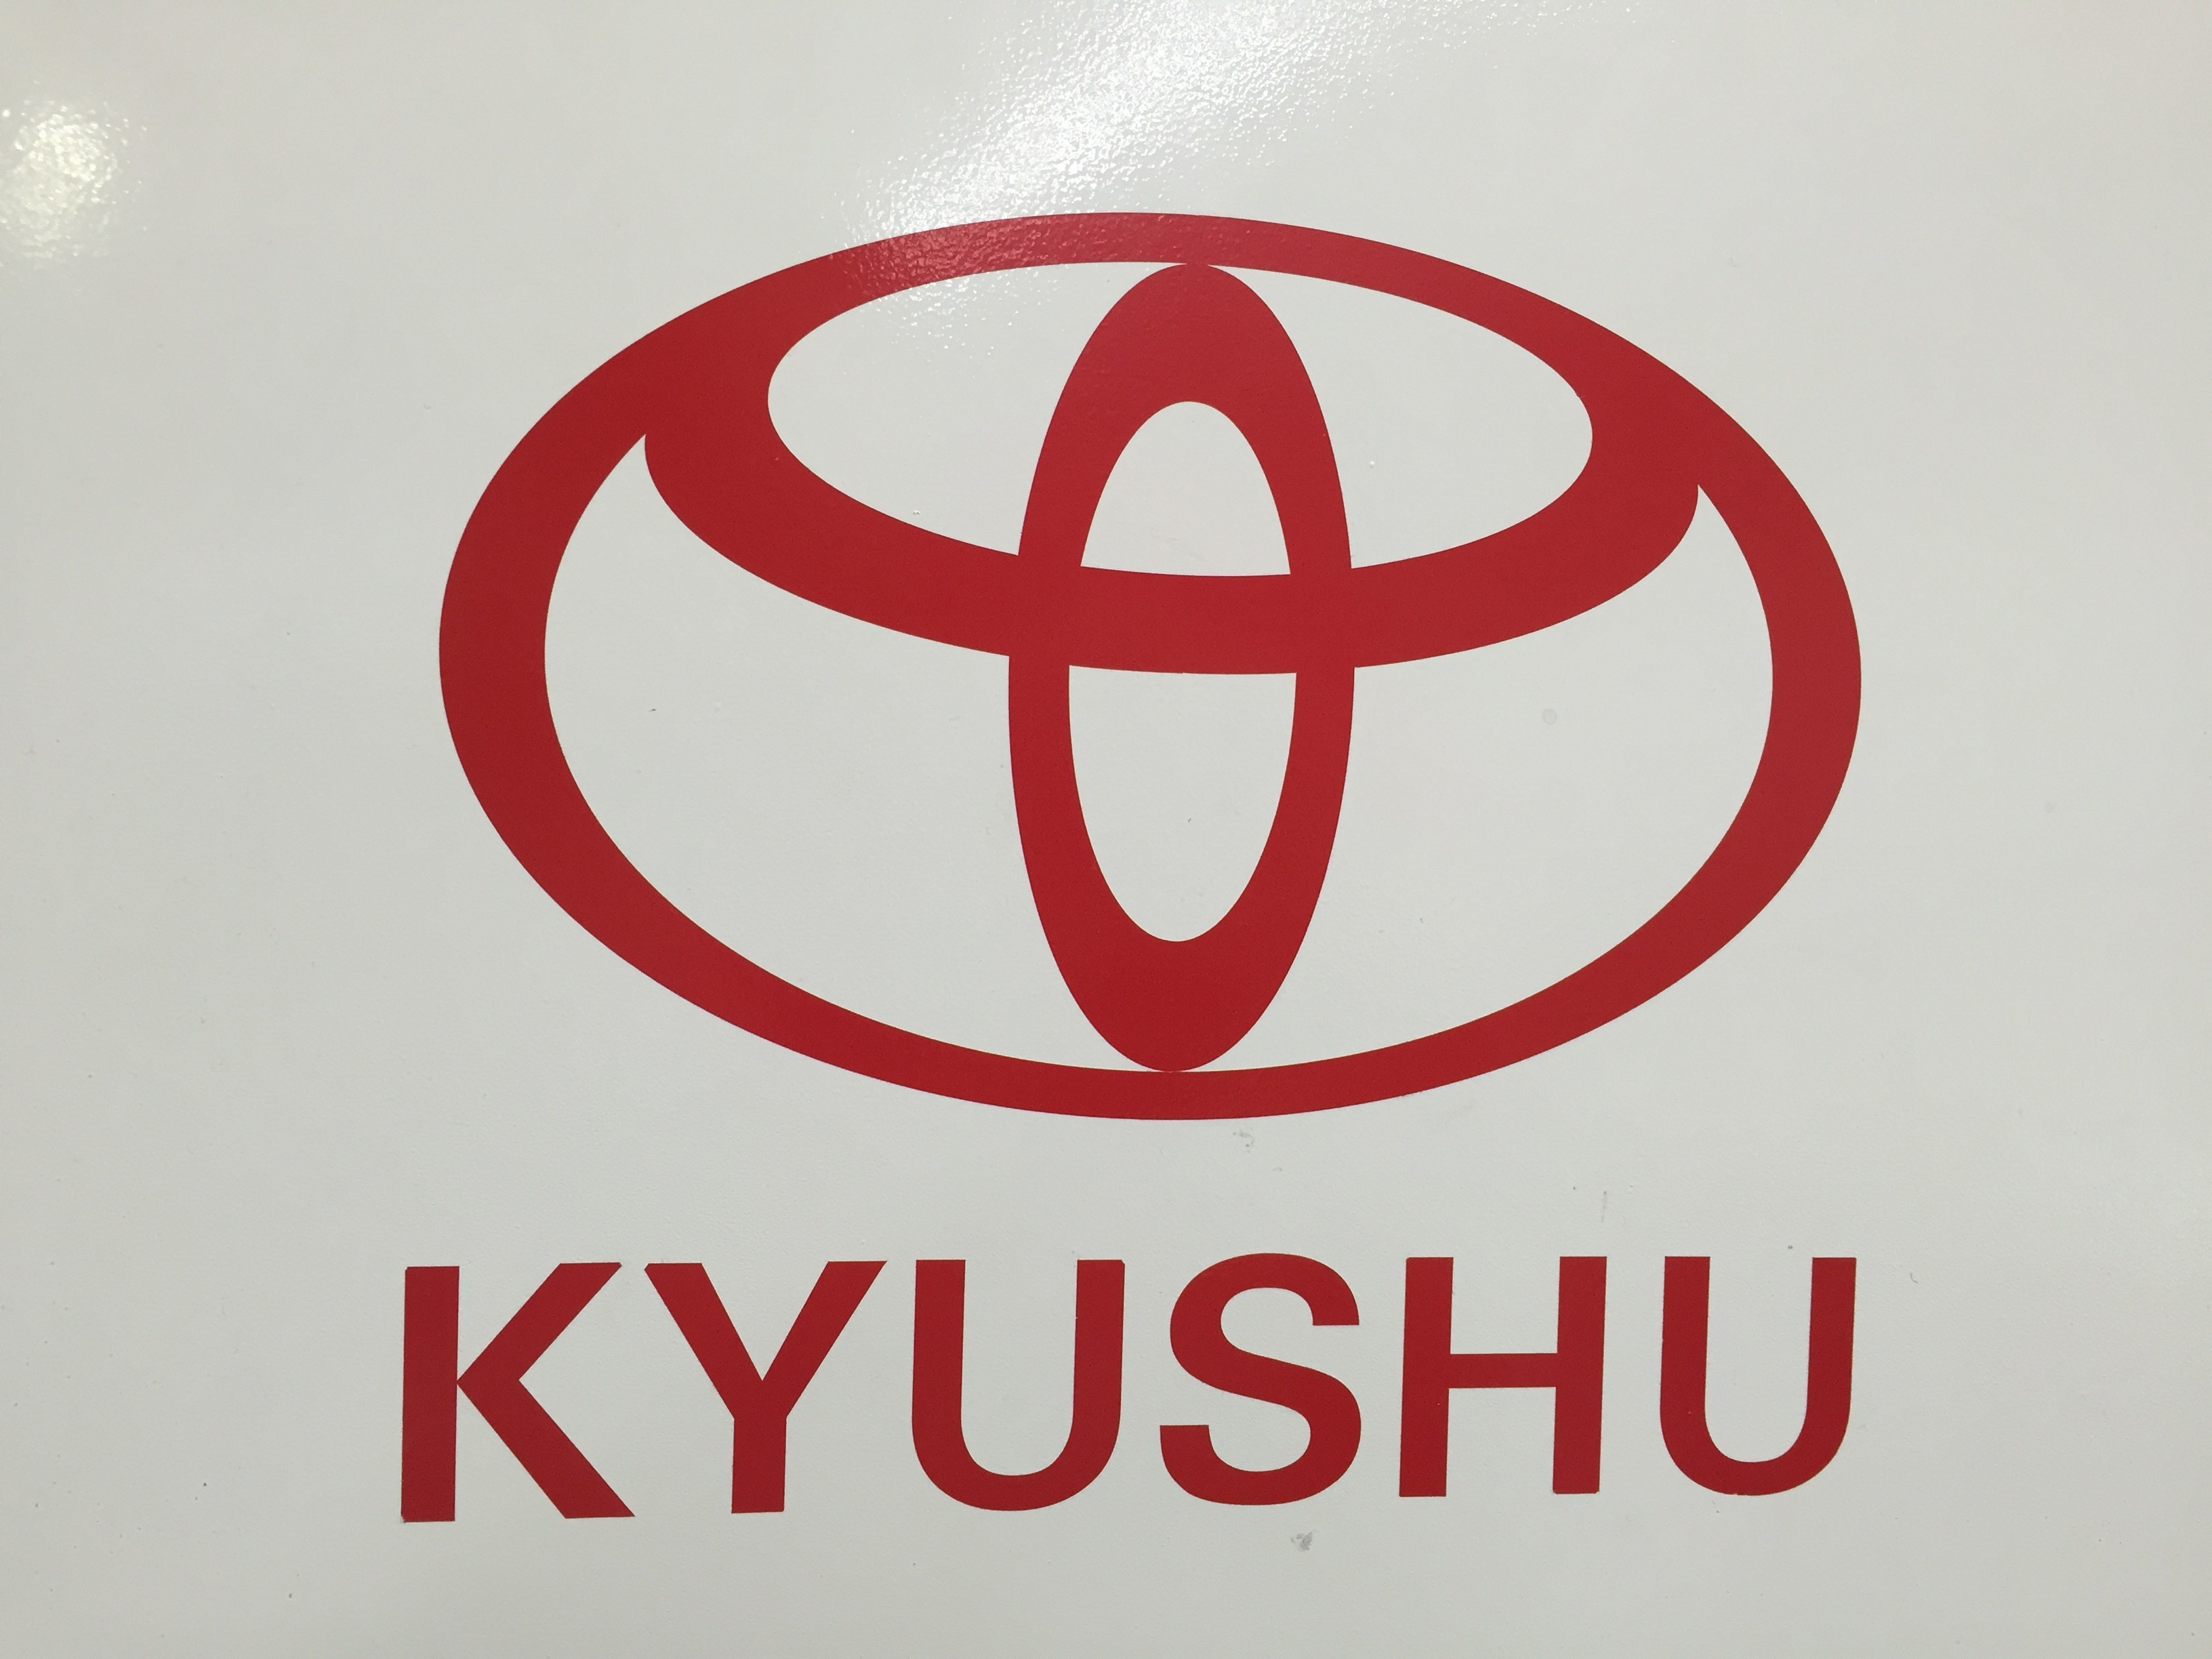 Toyota Kyushu